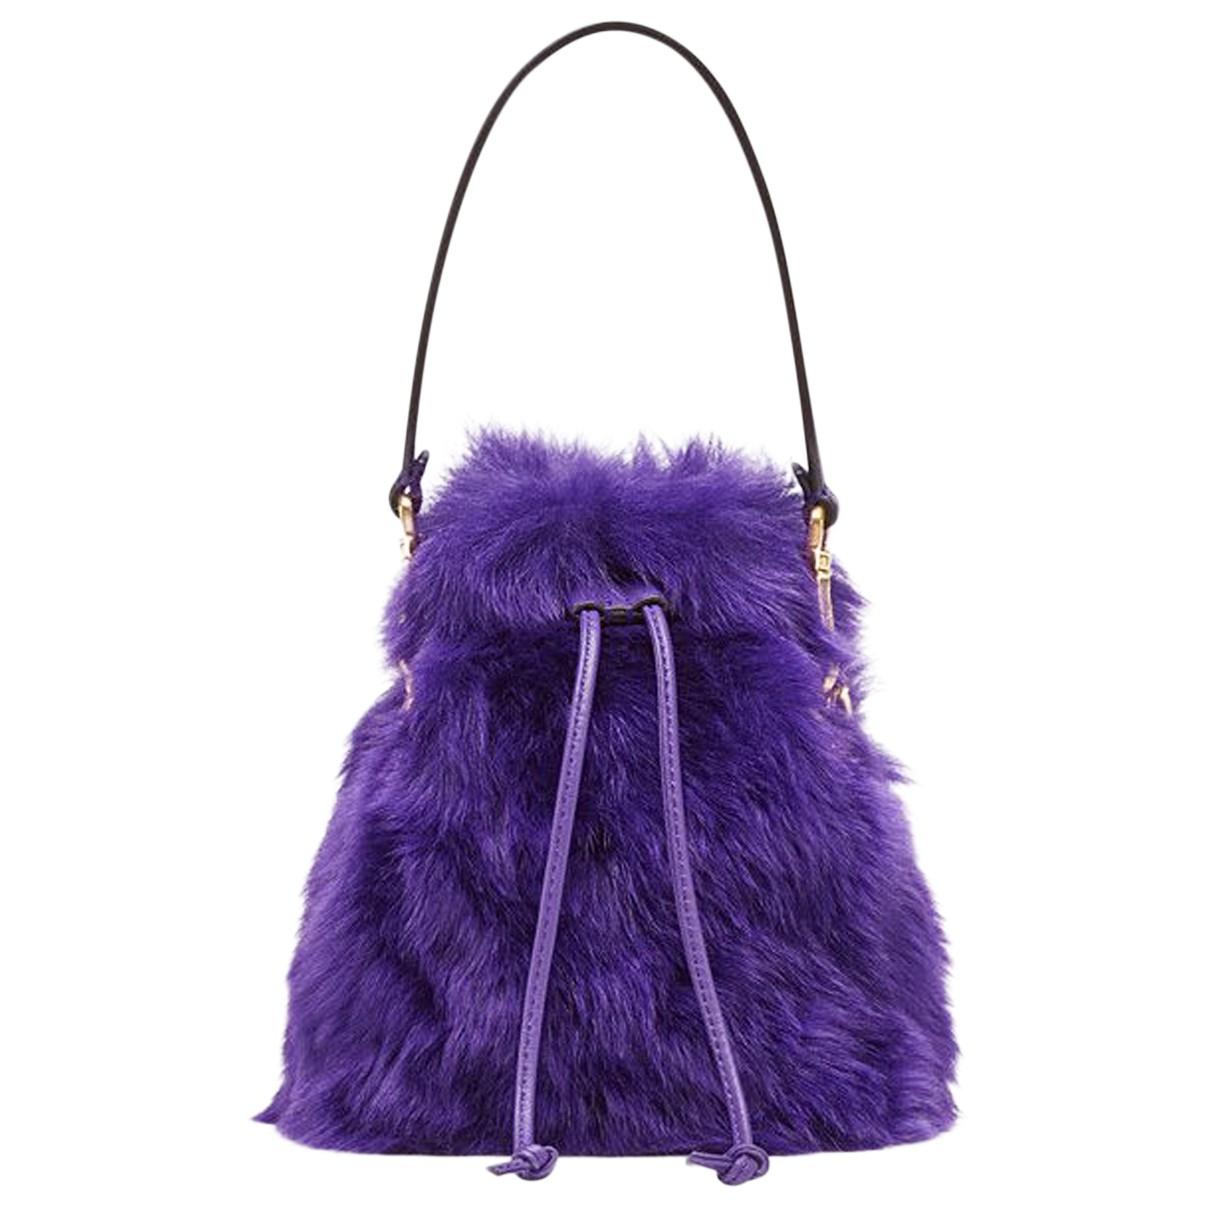 Fendi Mon Trésor Purple Leather handbag for Women N